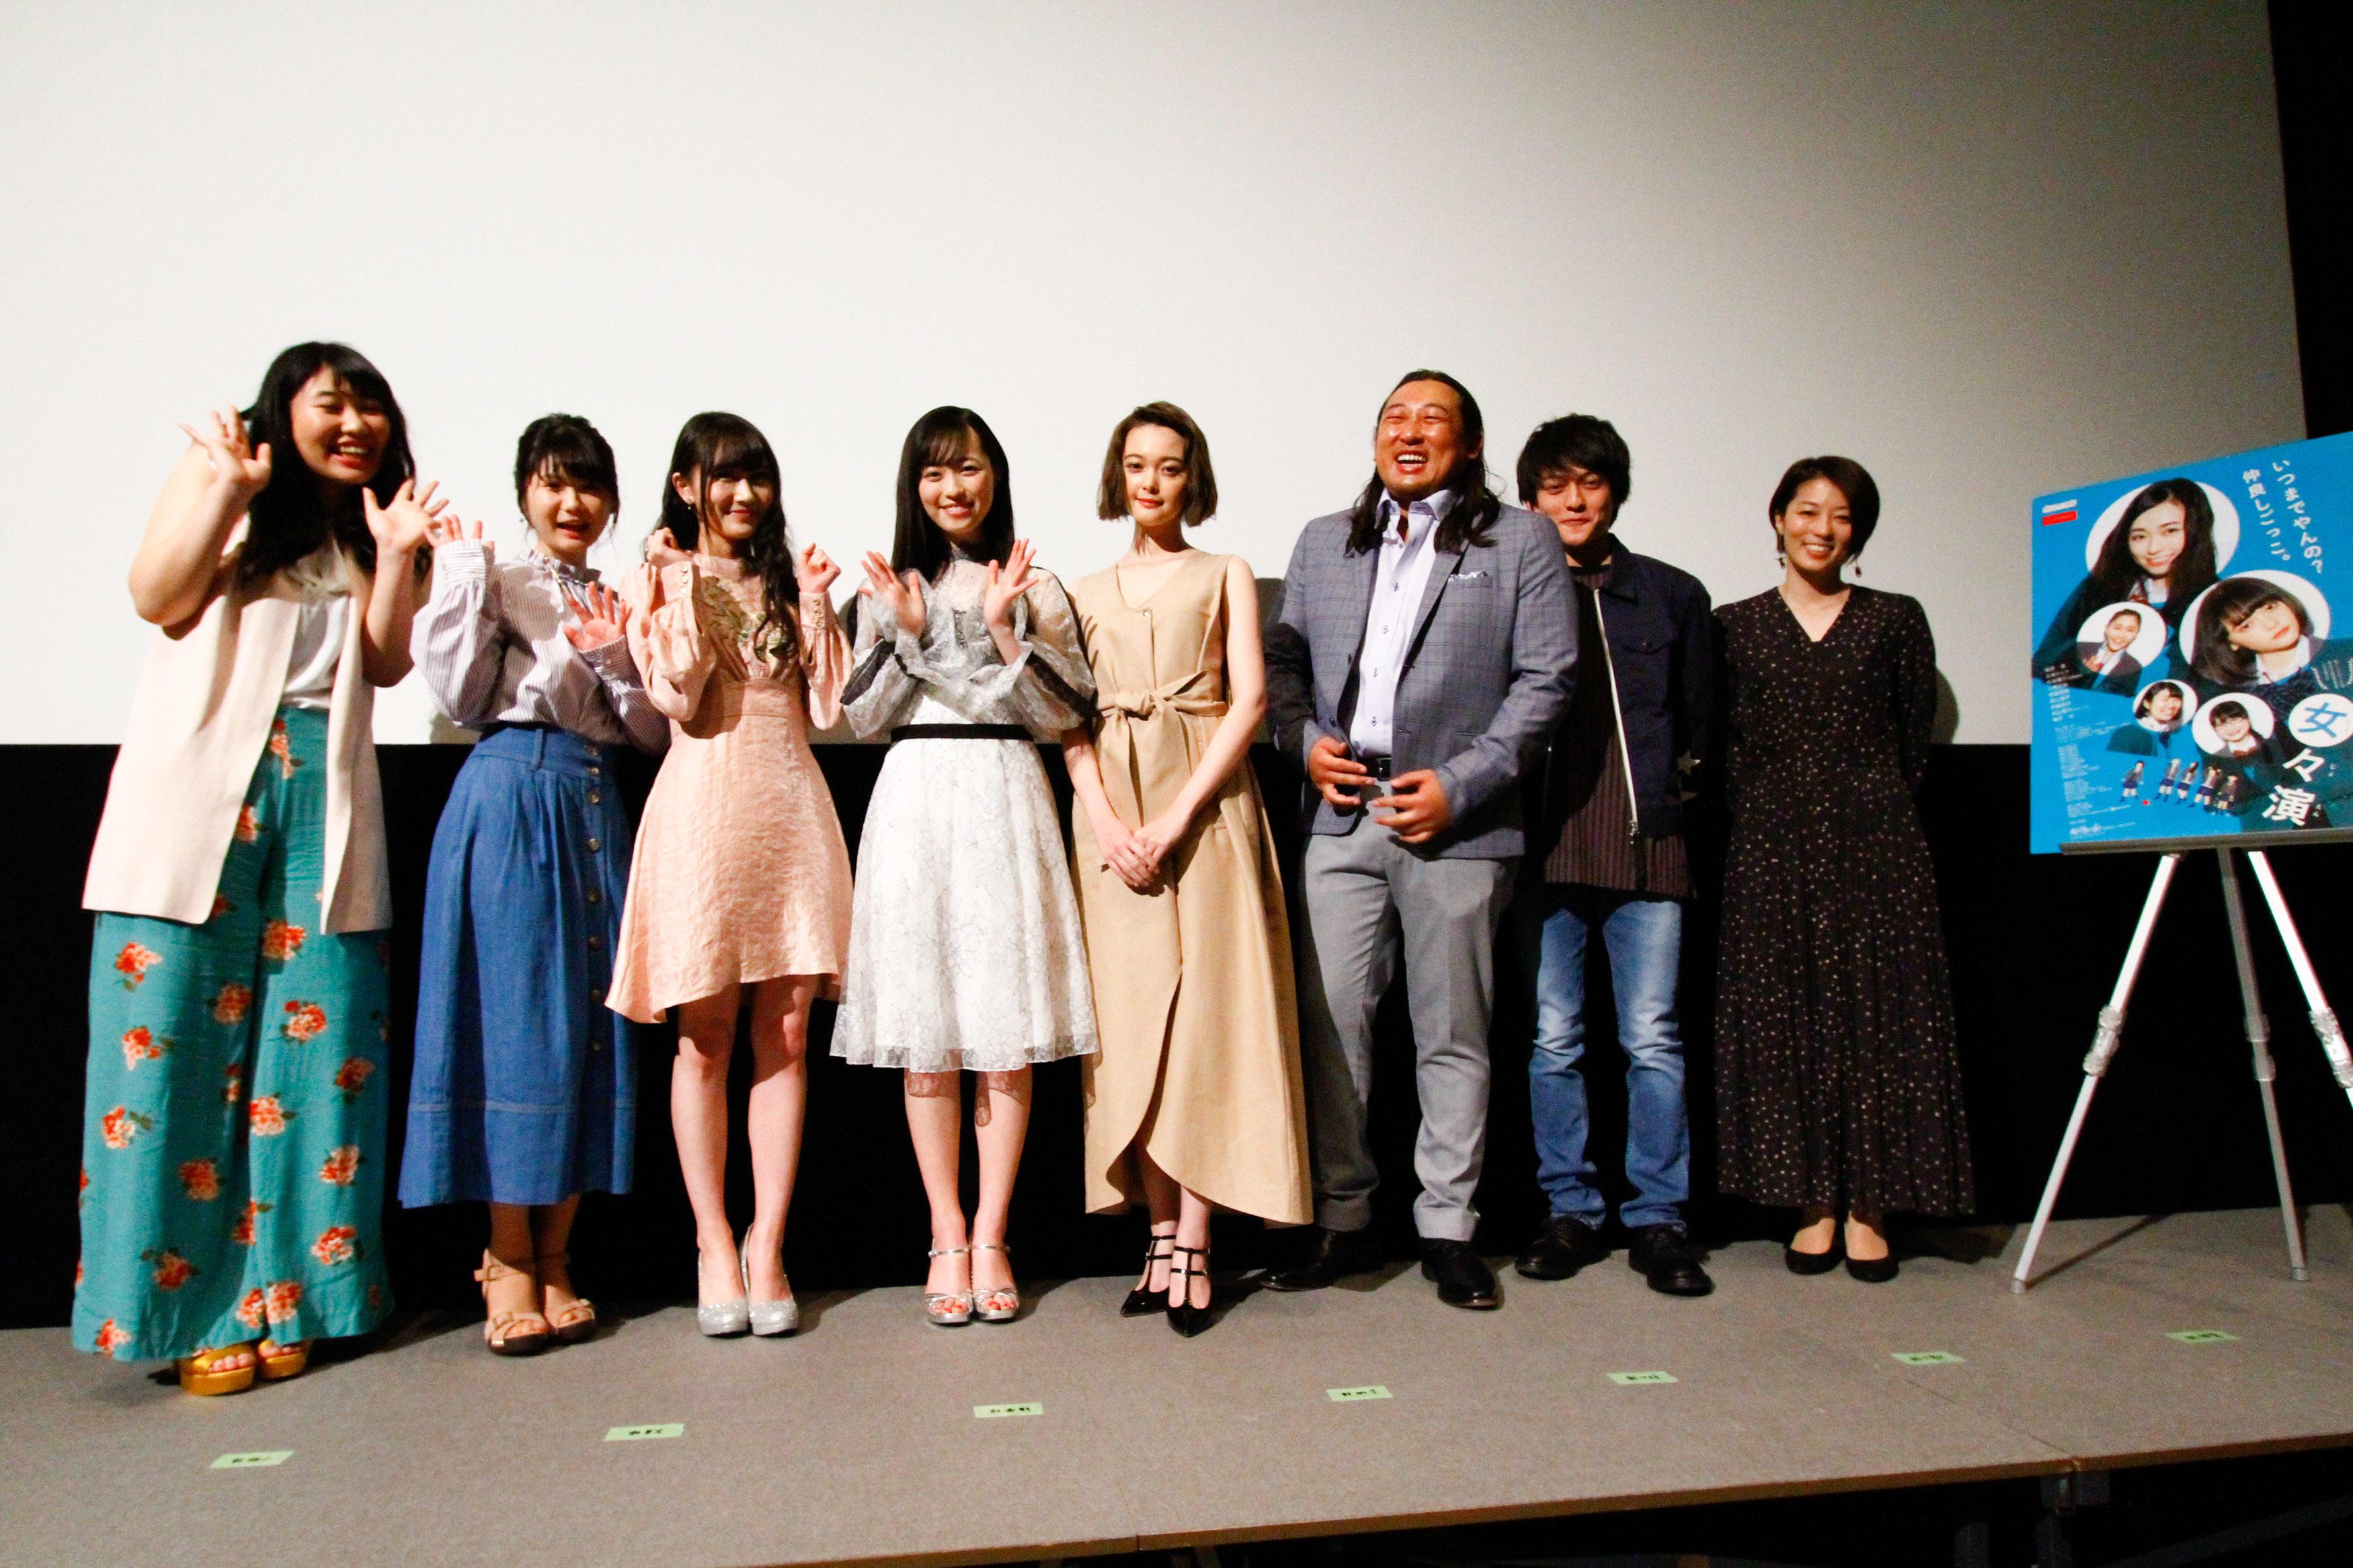 http://news.yoshimoto.co.jp/20180325083452-9e5fb4cfe5f24944341c31e874820886f96201de.jpg